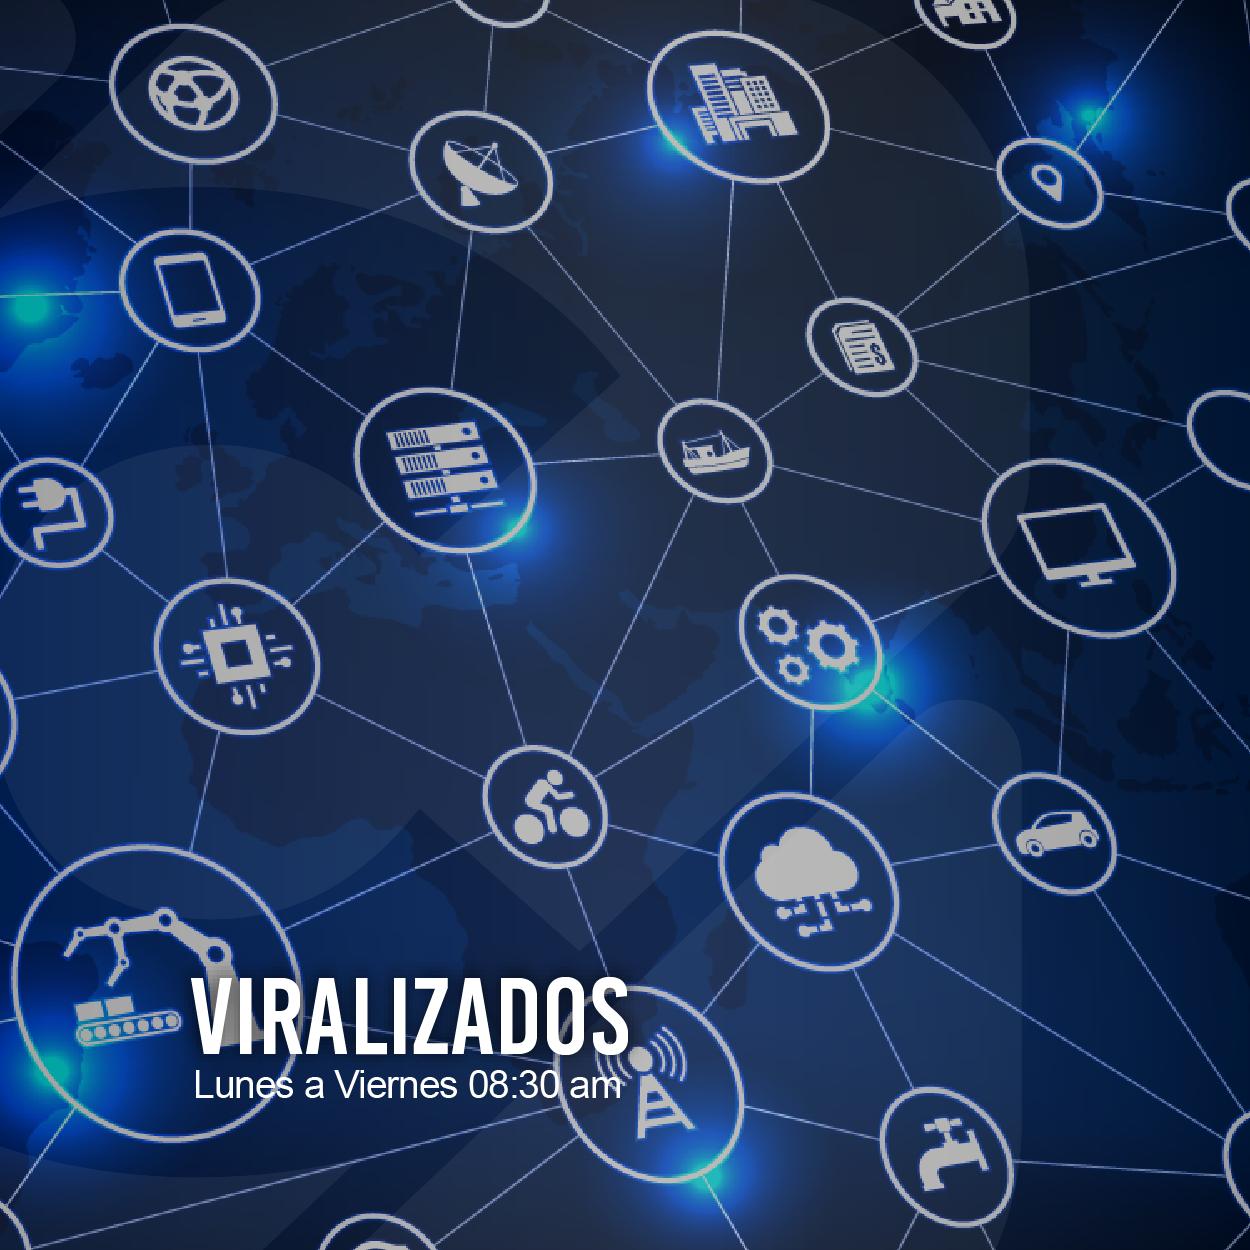 VIRALIZADOS-11